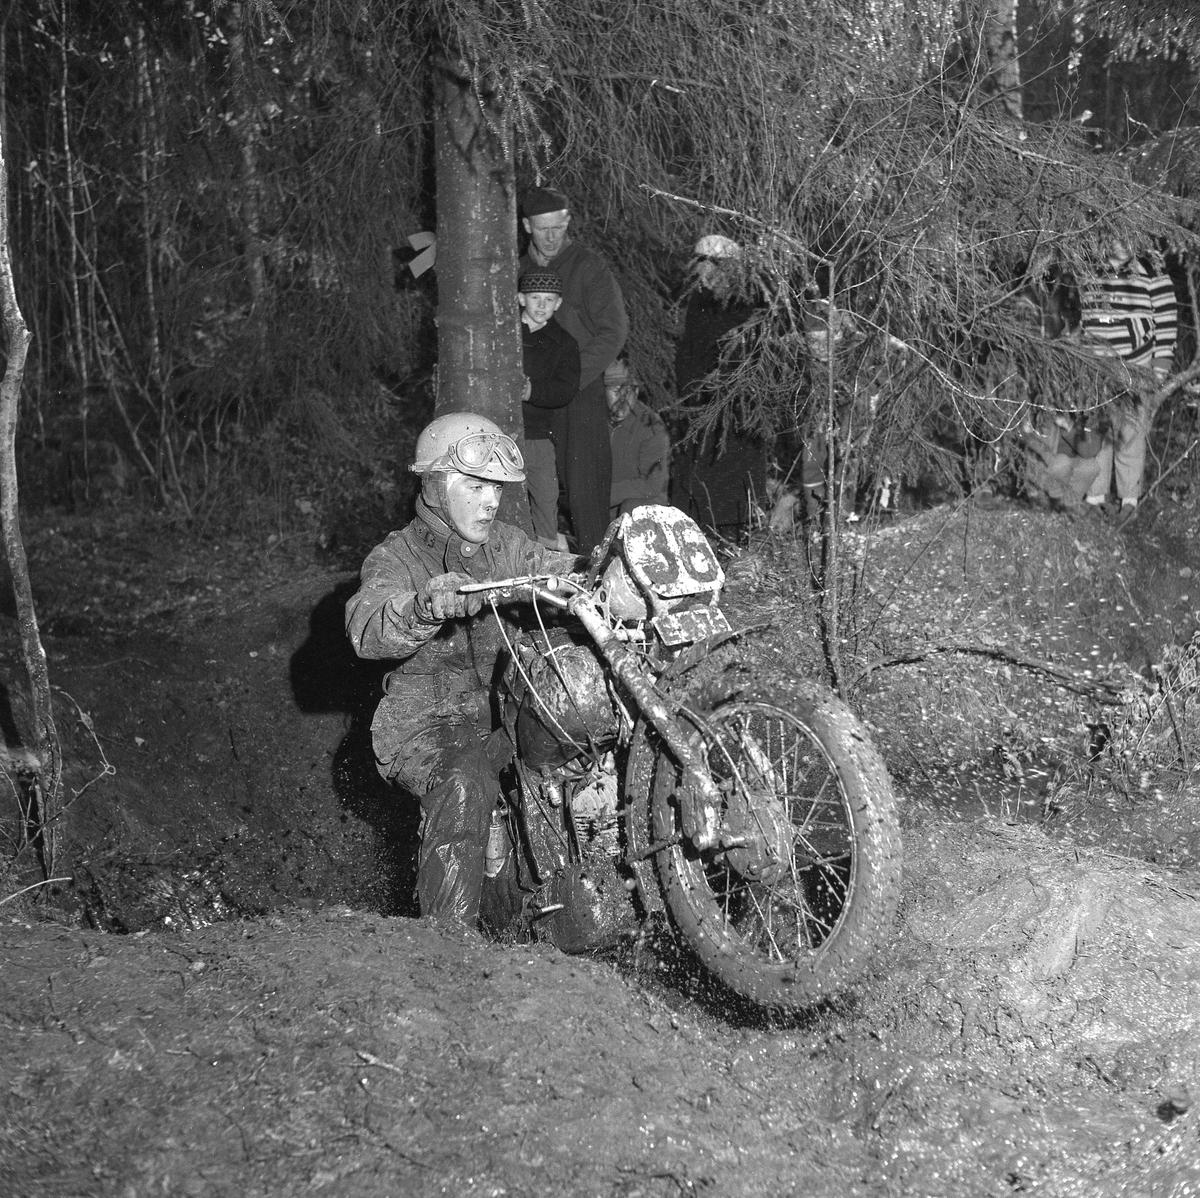 Brickebacksloppet. 27 oktober 1958.